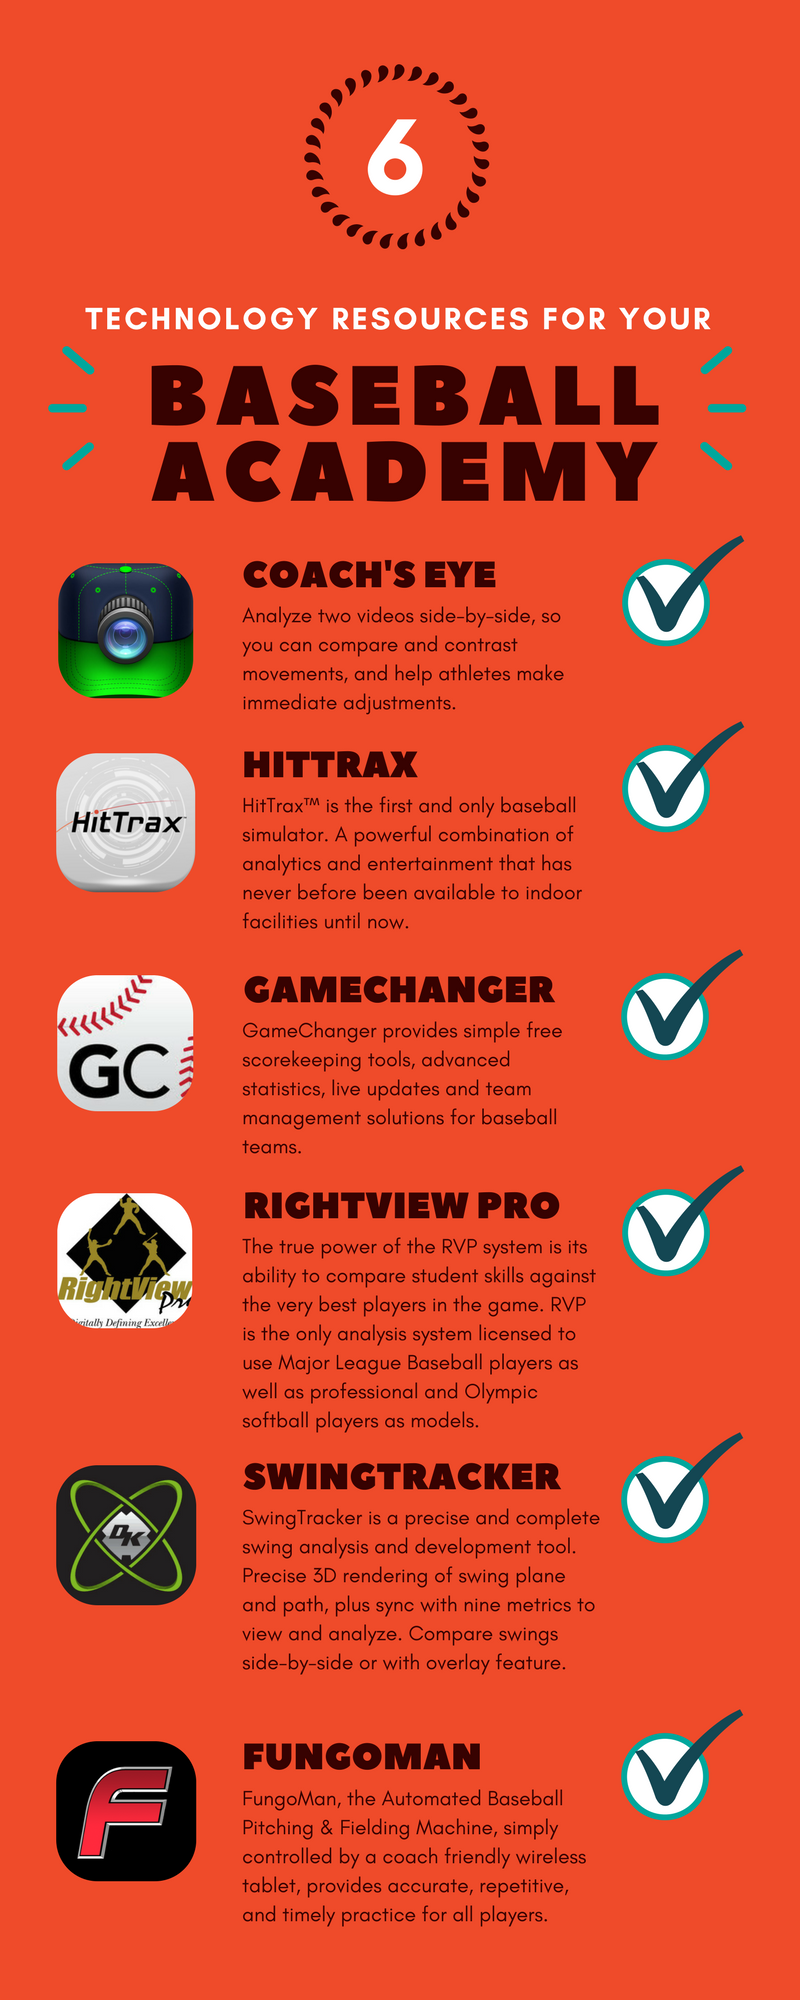 Technology For Baseball Academies (1)-1.png